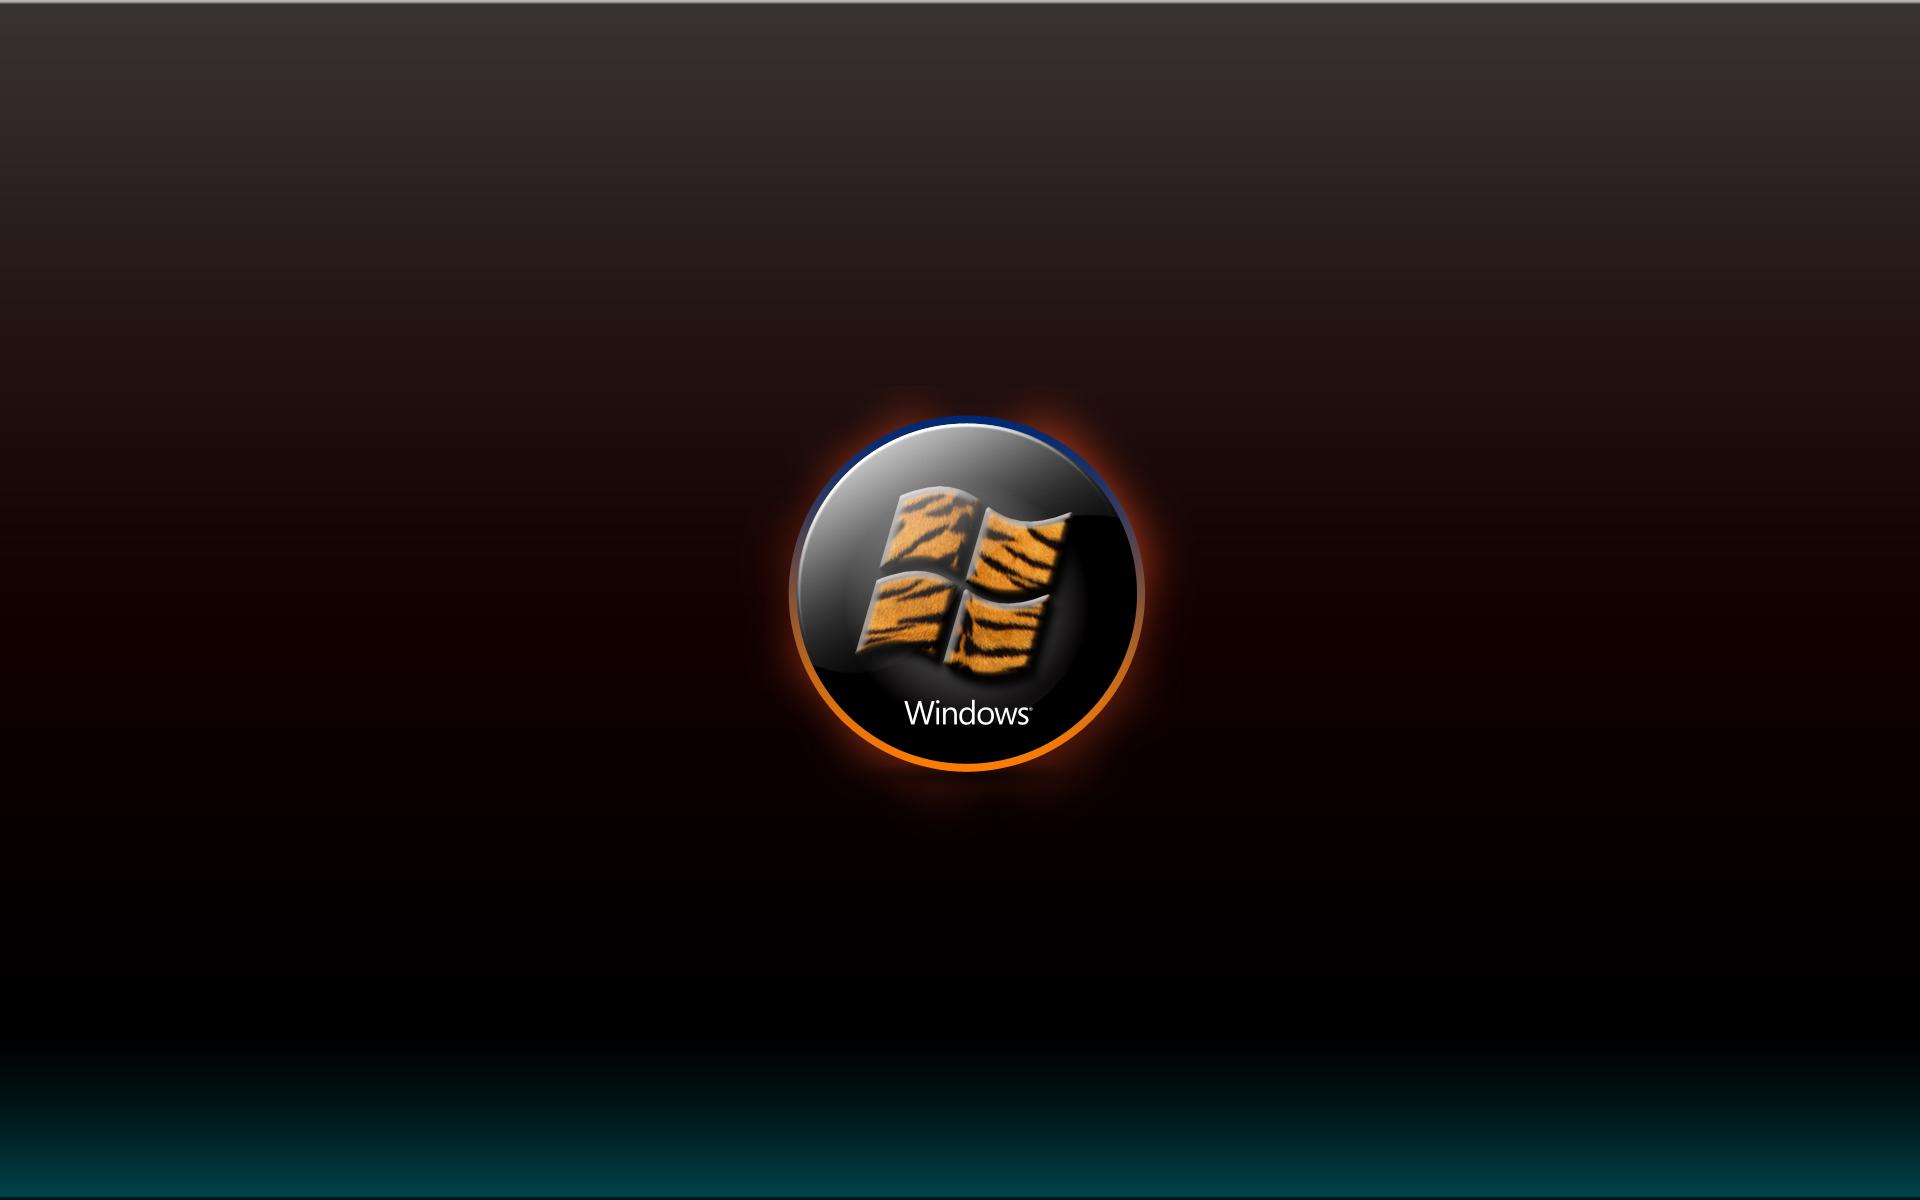 Windows Windows Phone Logo Wallpaper 壁紙 Tiger